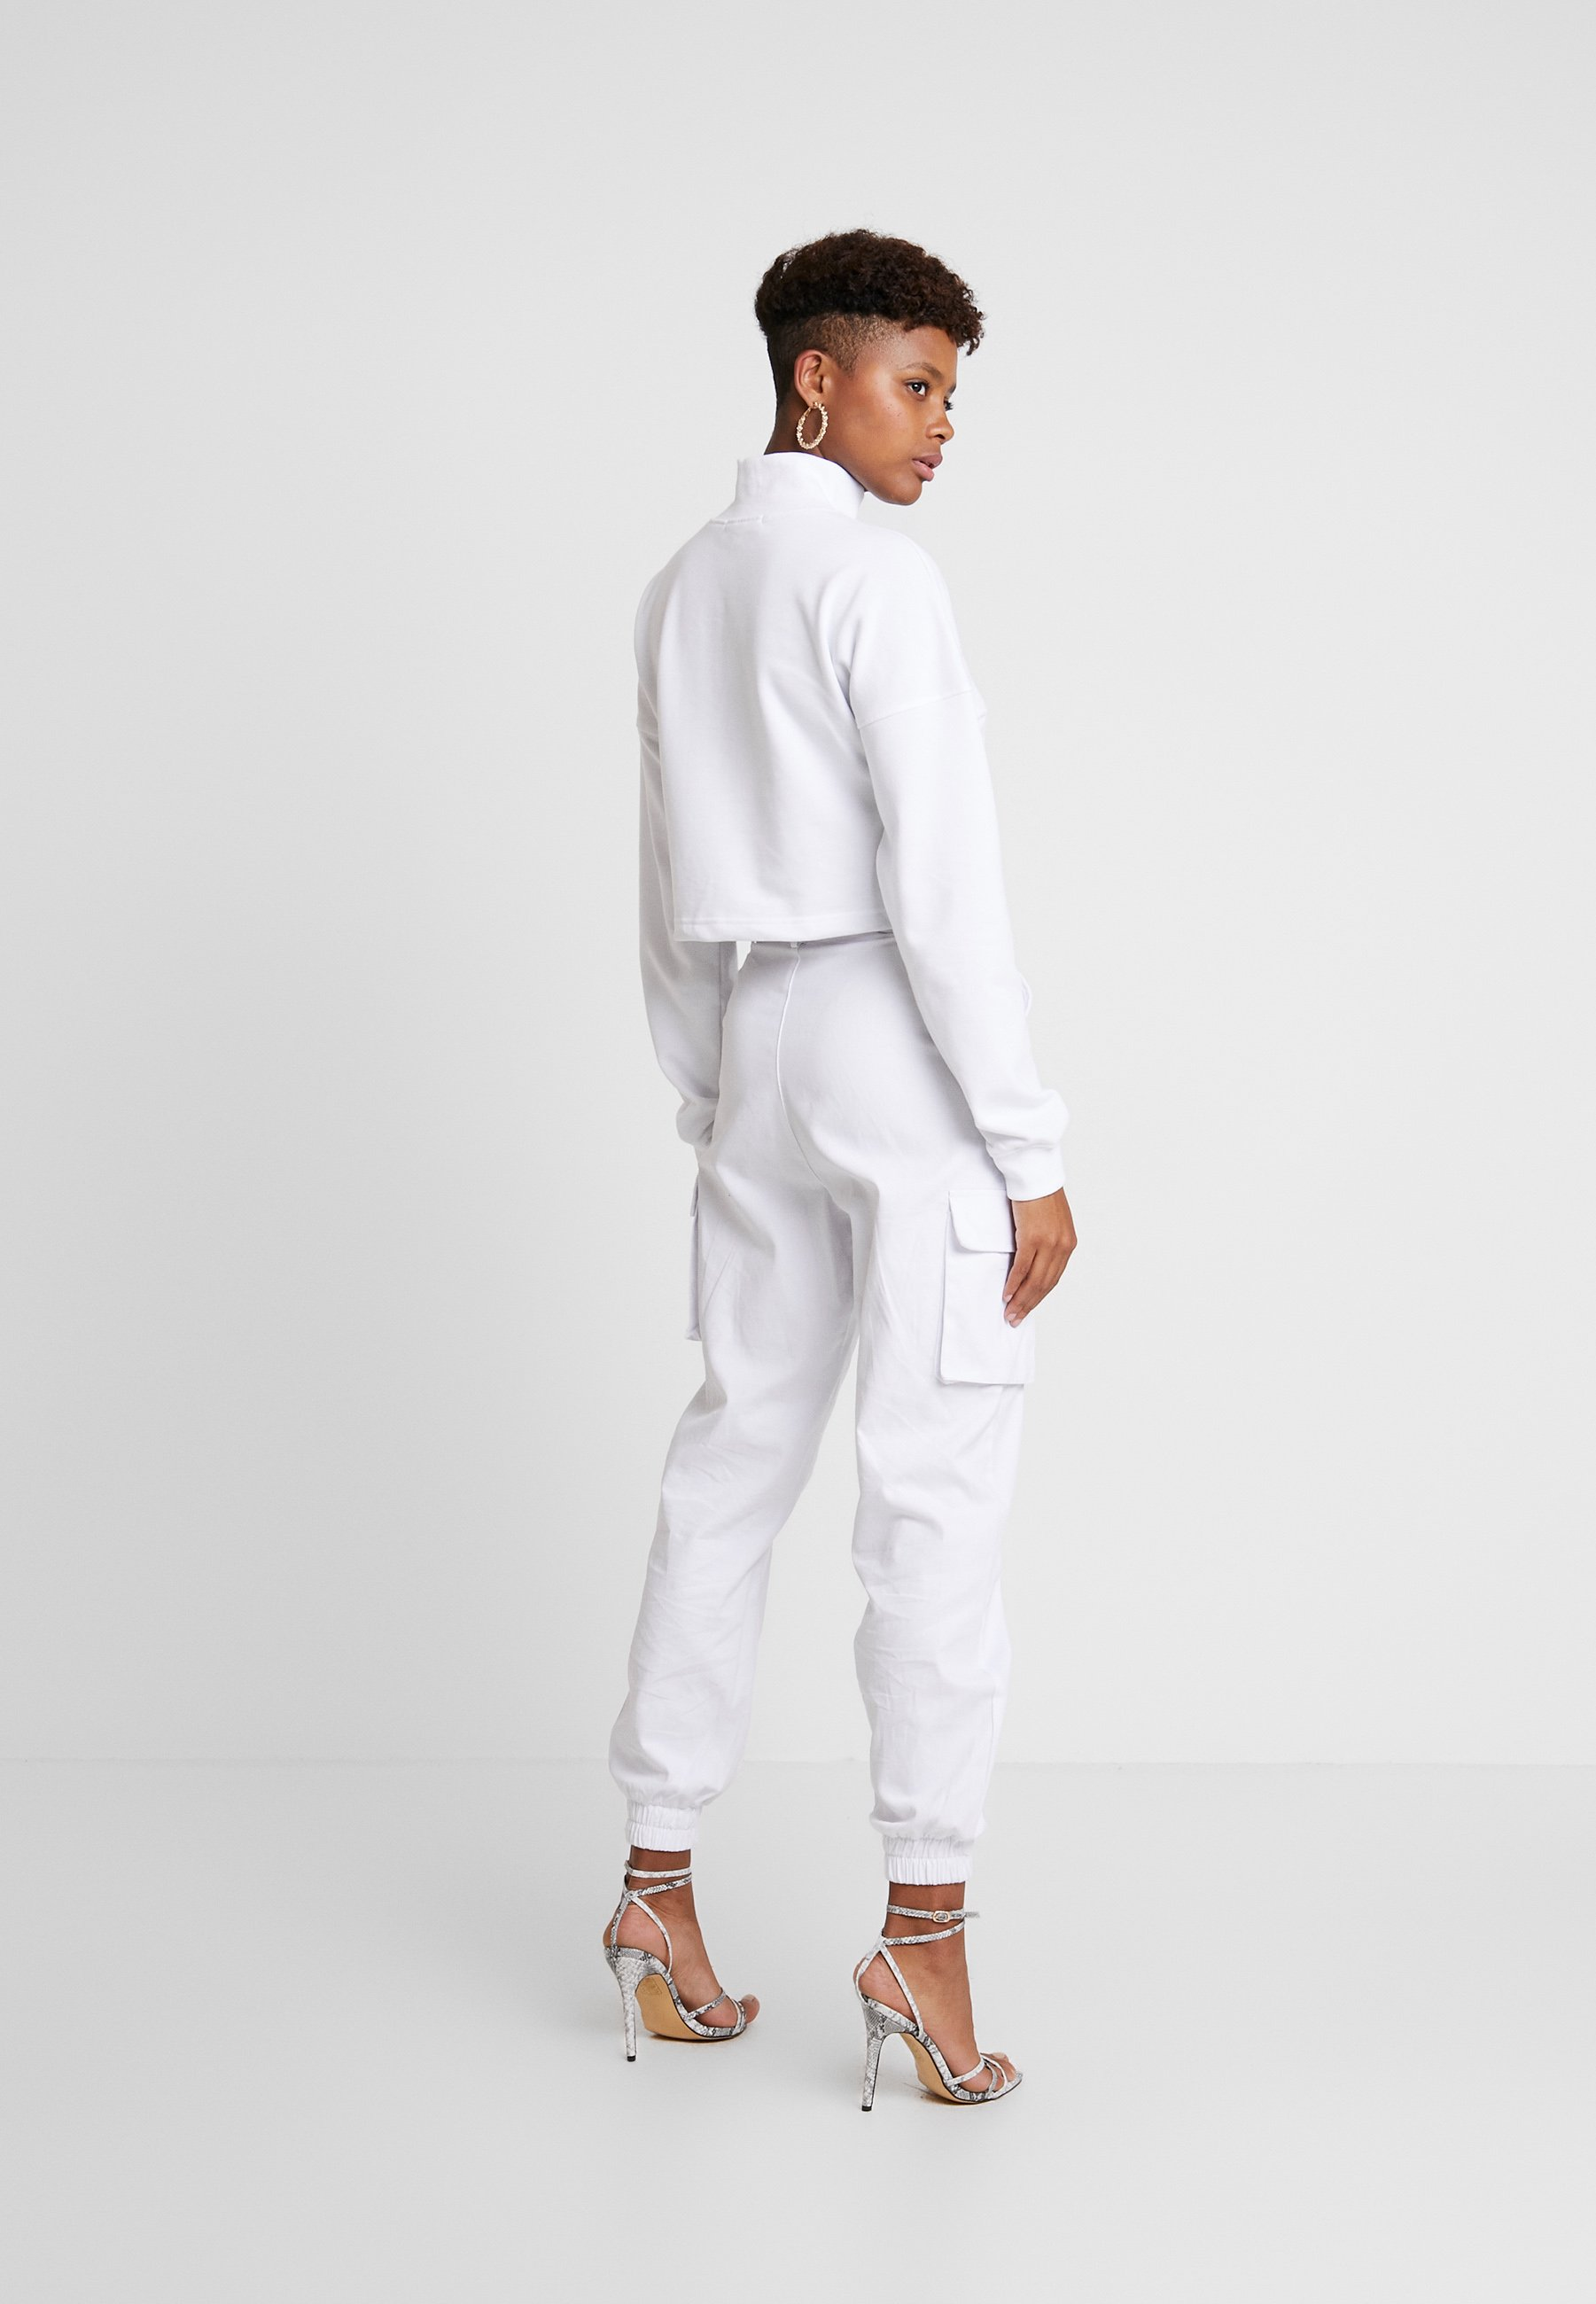 SweatSweatshirt Branded Cropped Cropped White Branded Branded White Missguided Cropped SweatSweatshirt Missguided Missguided N0wOZPk8Xn